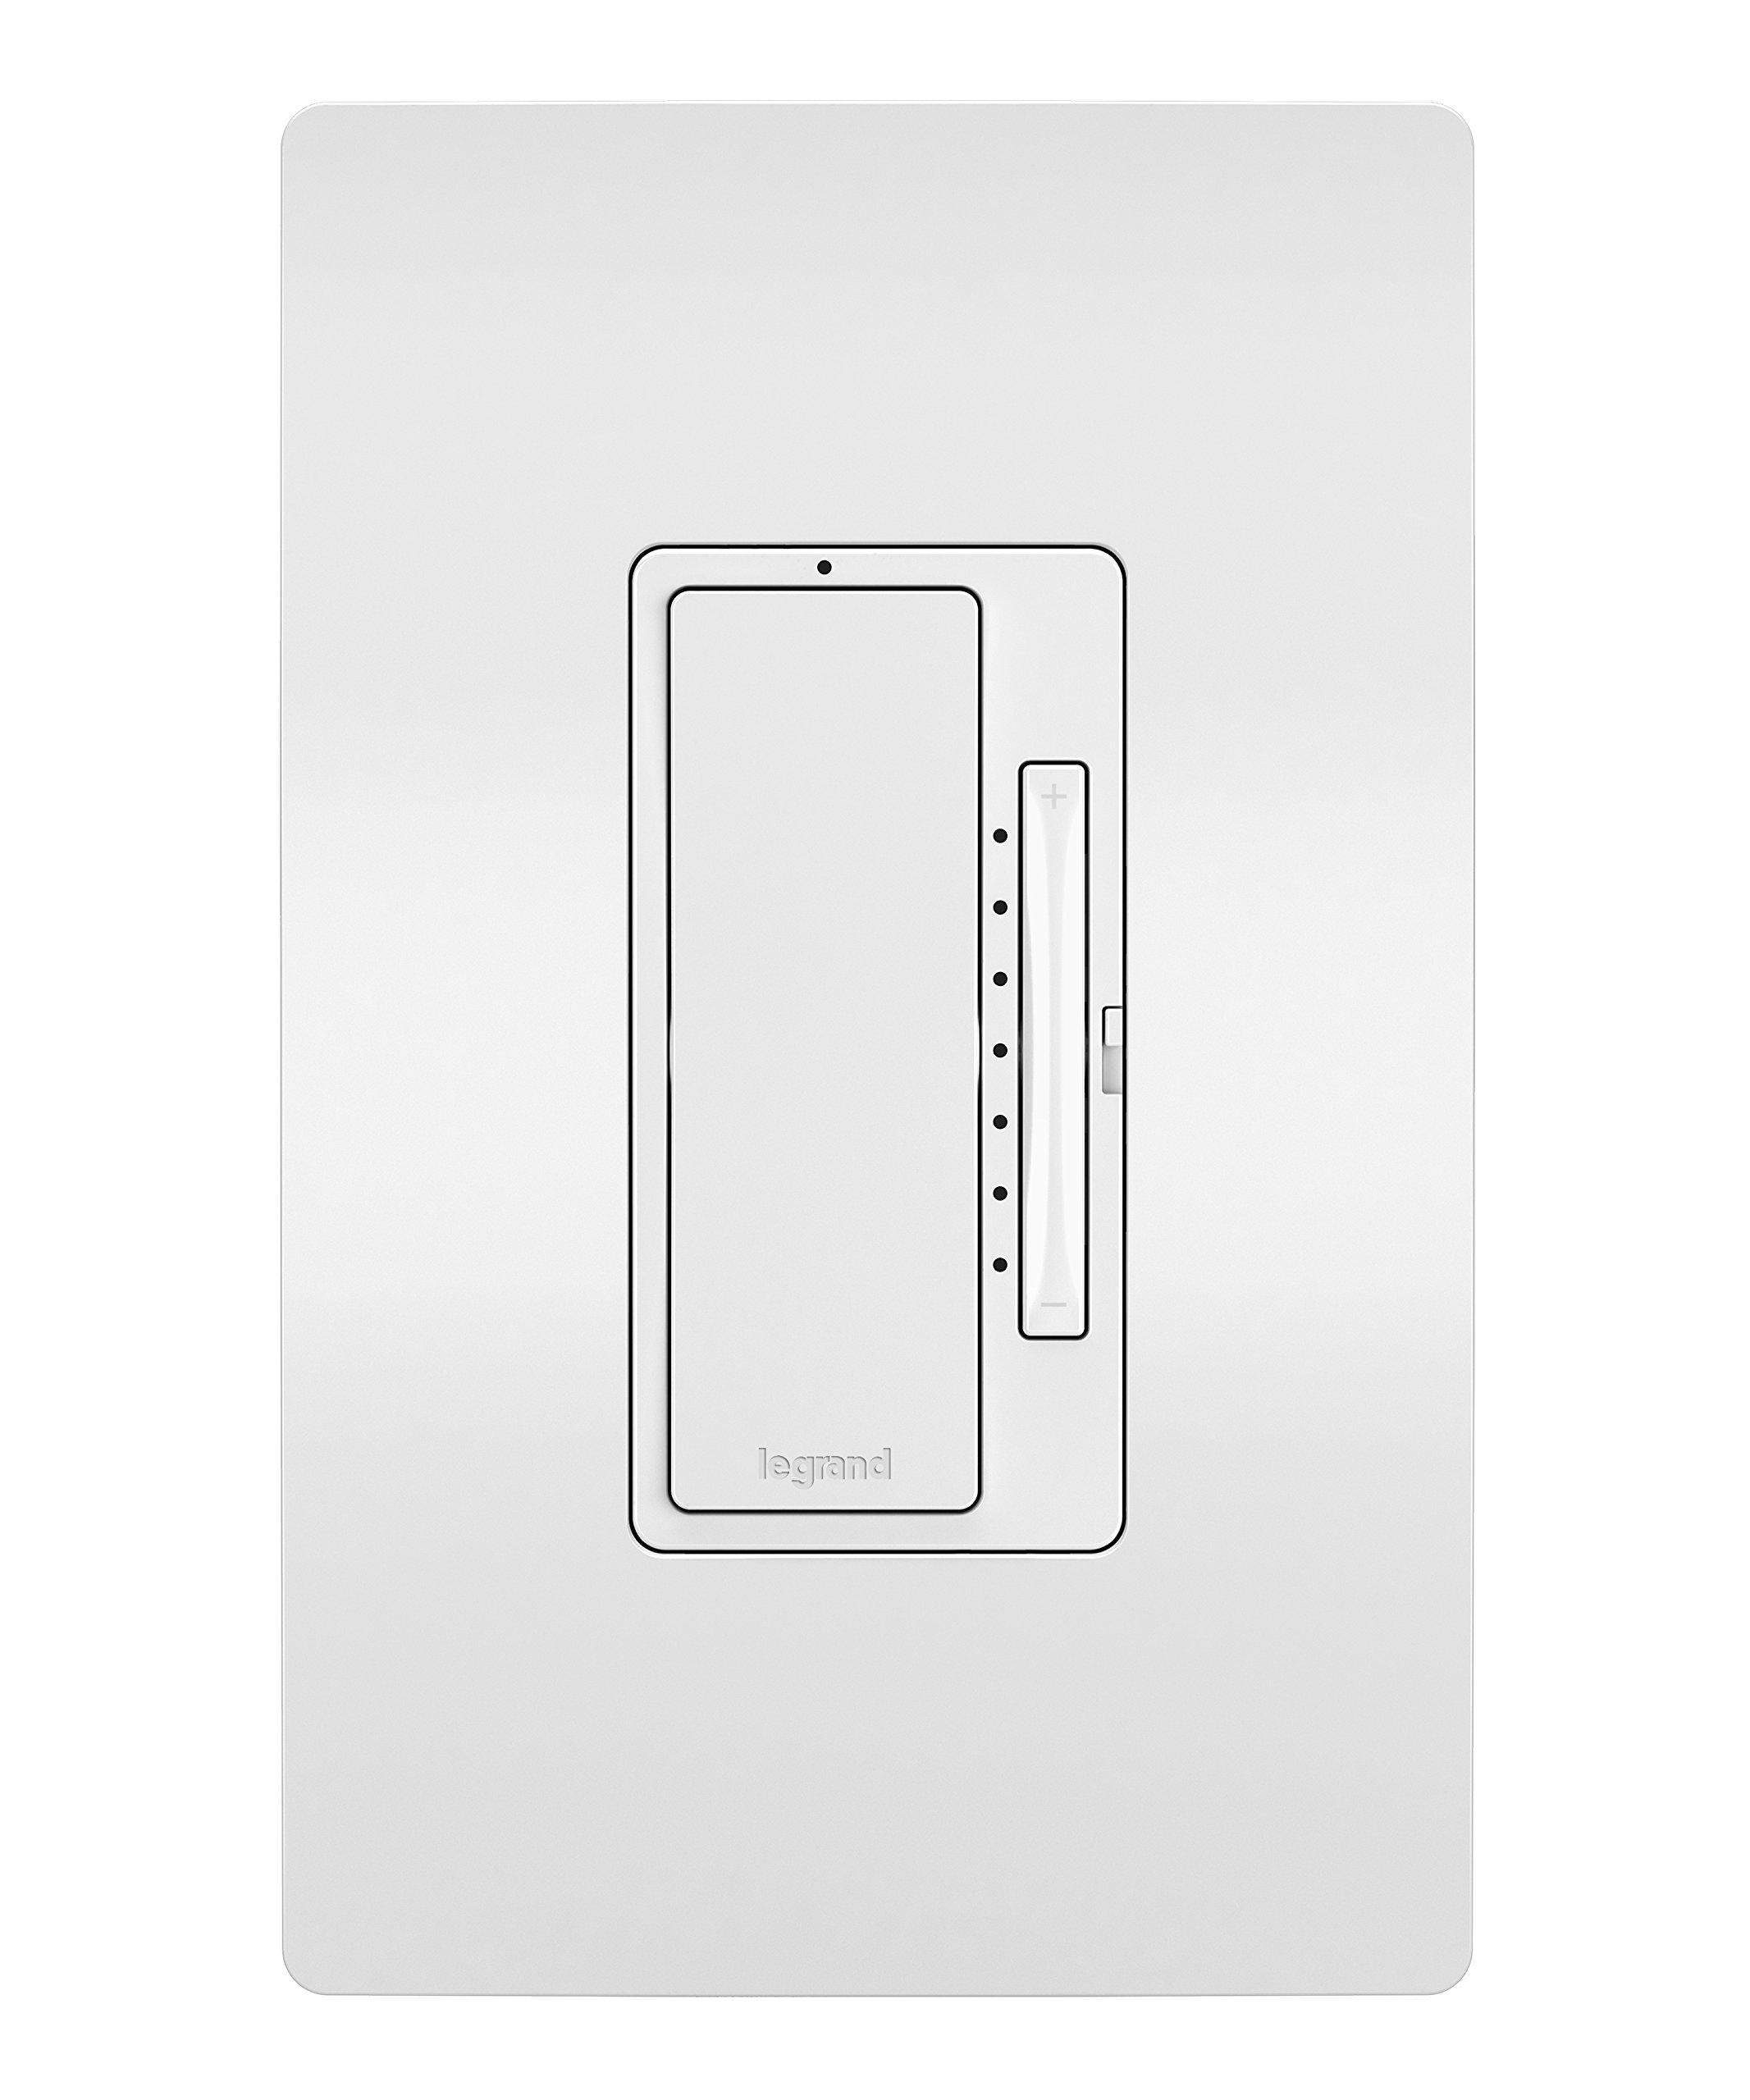 Legrand - Pass & Seymour Radiant Smart WWRL50WH Tru-Universal Wi-Fi Enabled Dimmer, White